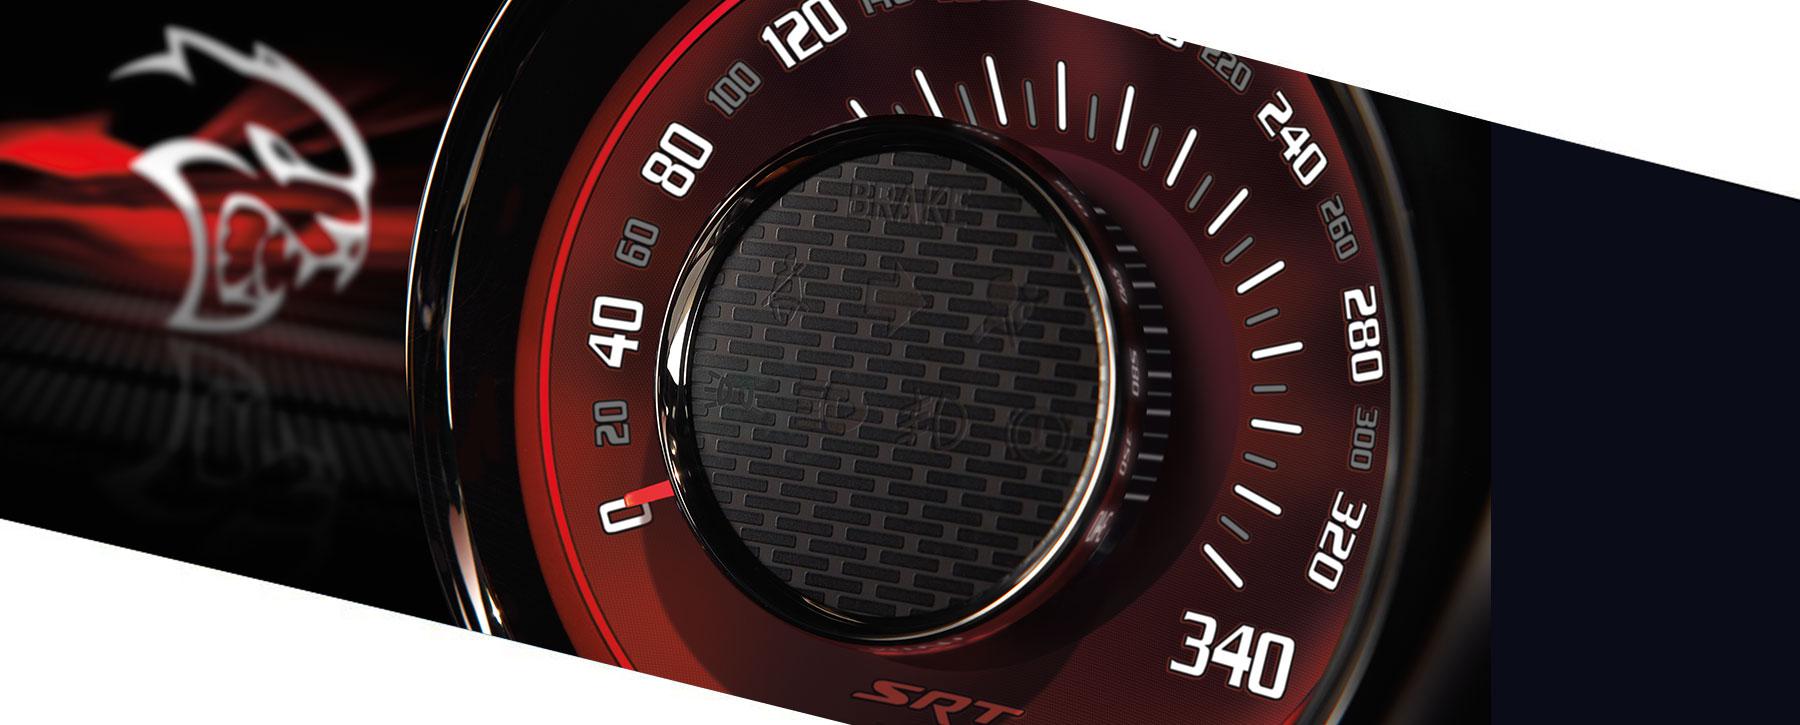 dodge hellcat speedometer 340 kmh